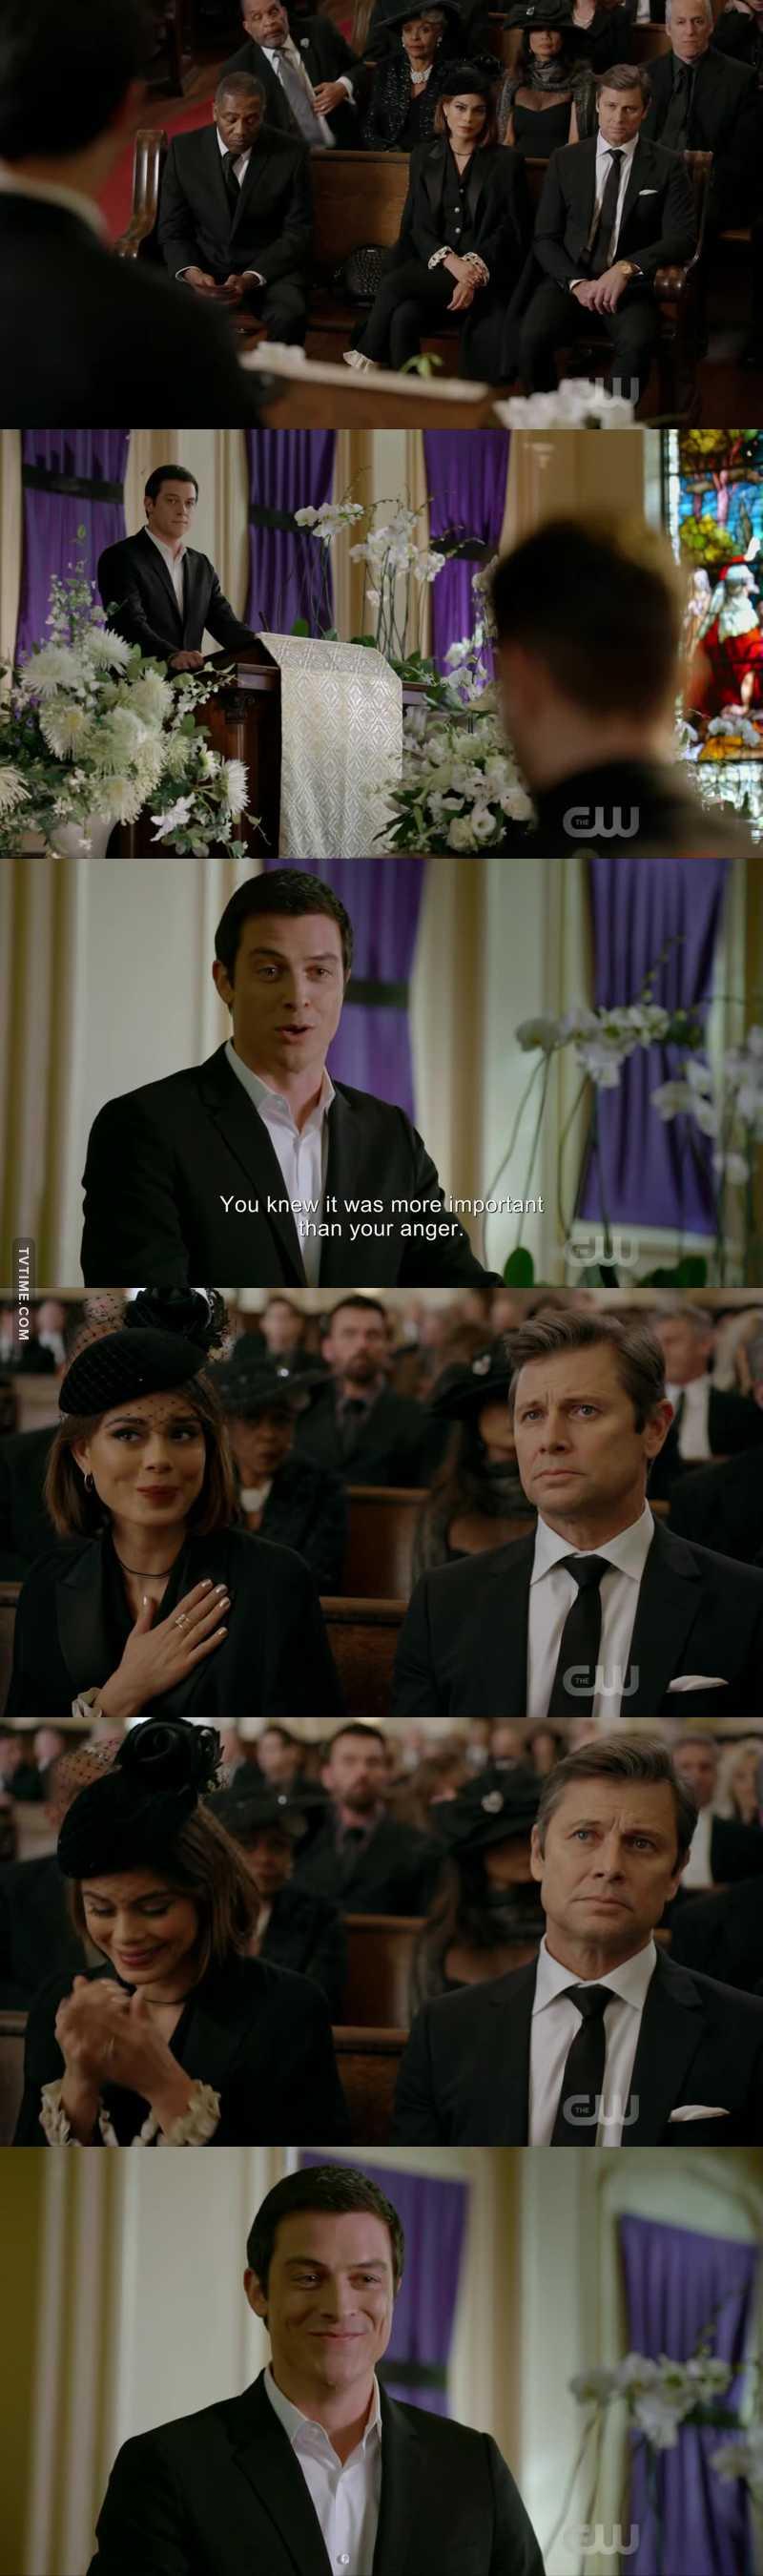 I love this scene 😍